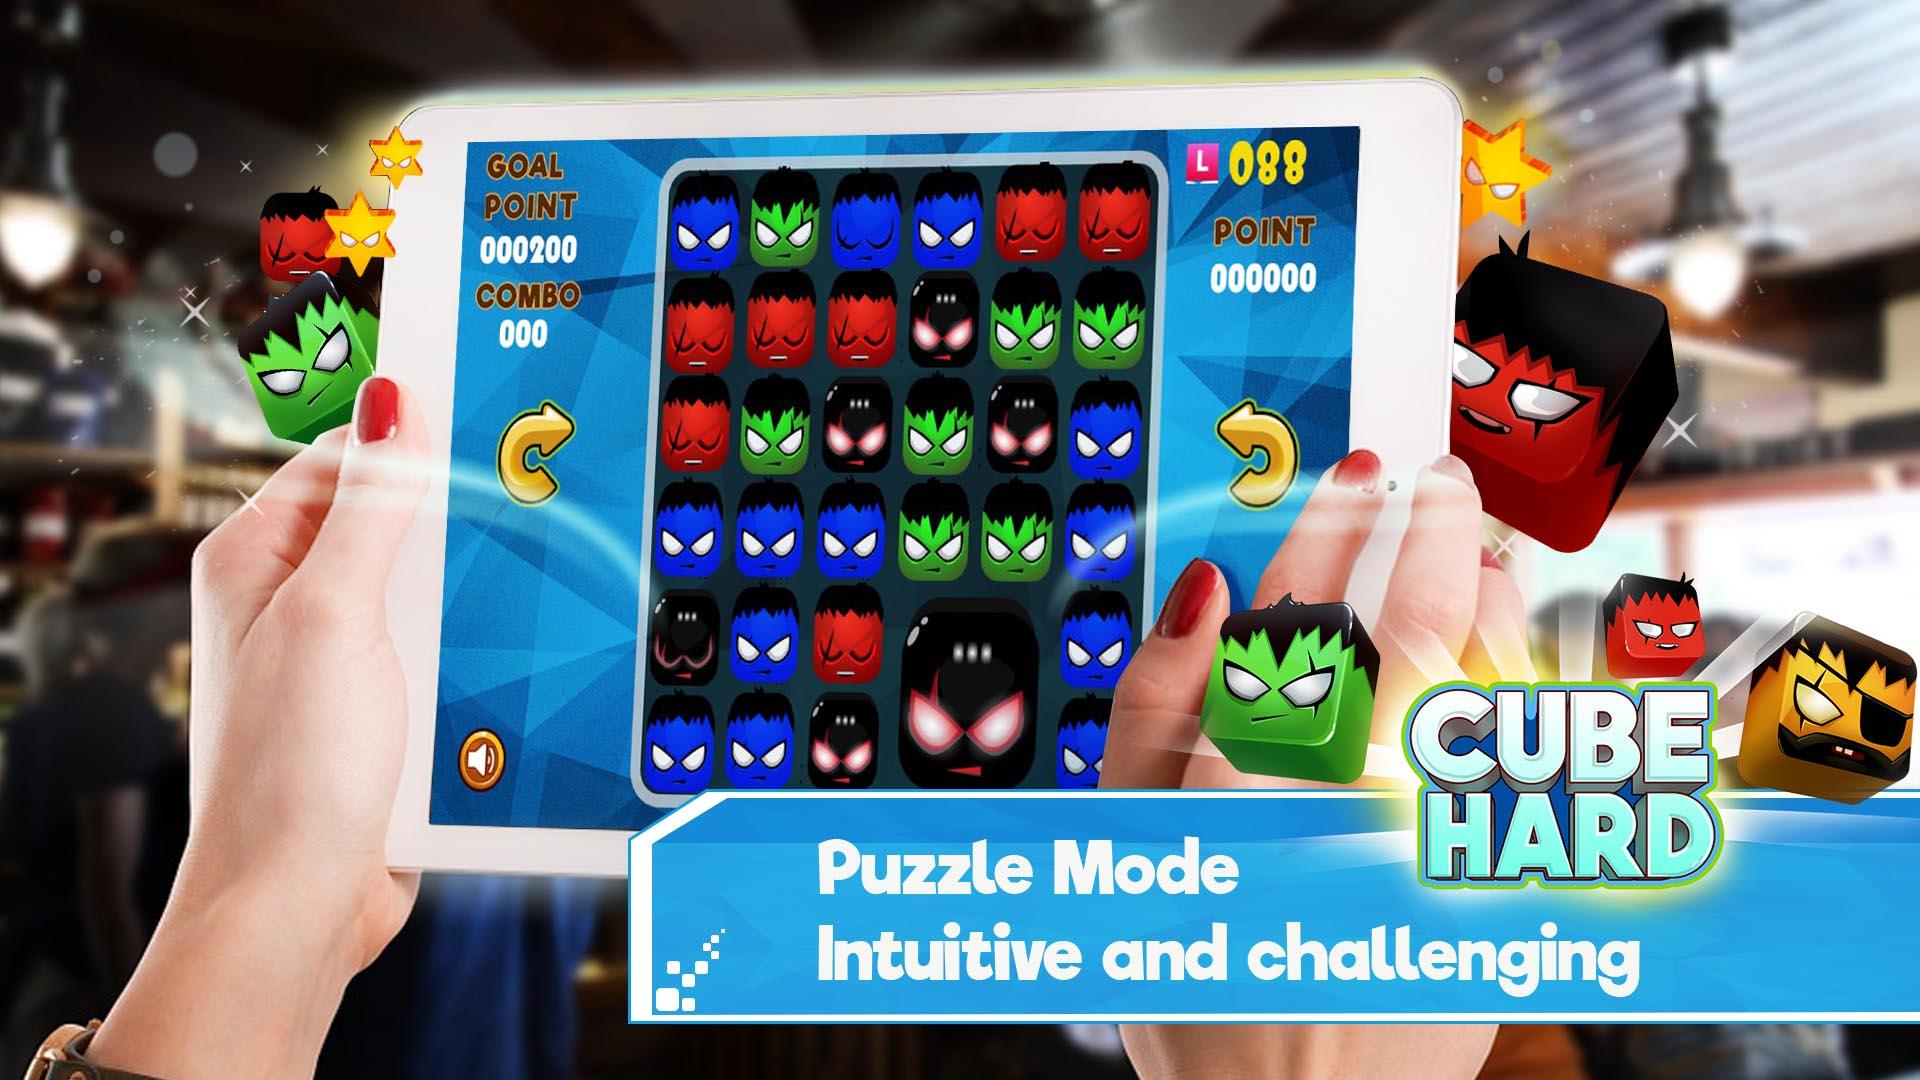 Cube Hard: Match 4